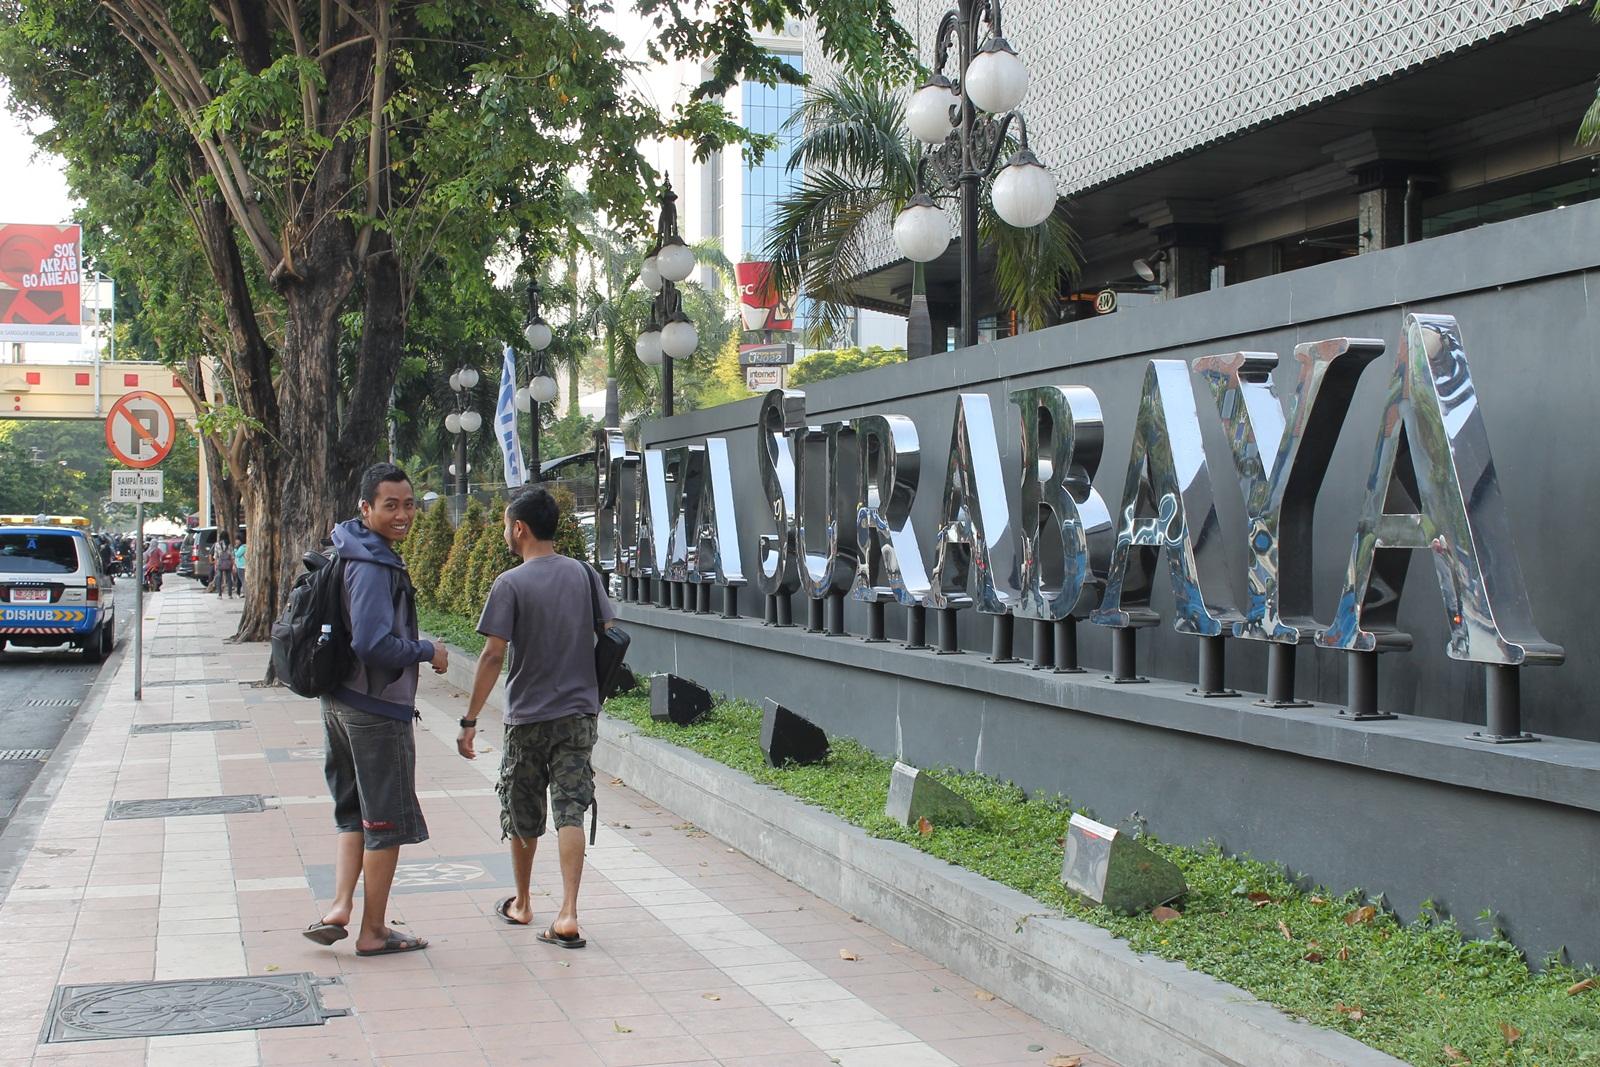 Wisata Tidak Mahal Taman Prestasi Skate Bmx Surabaya Tuh Dua